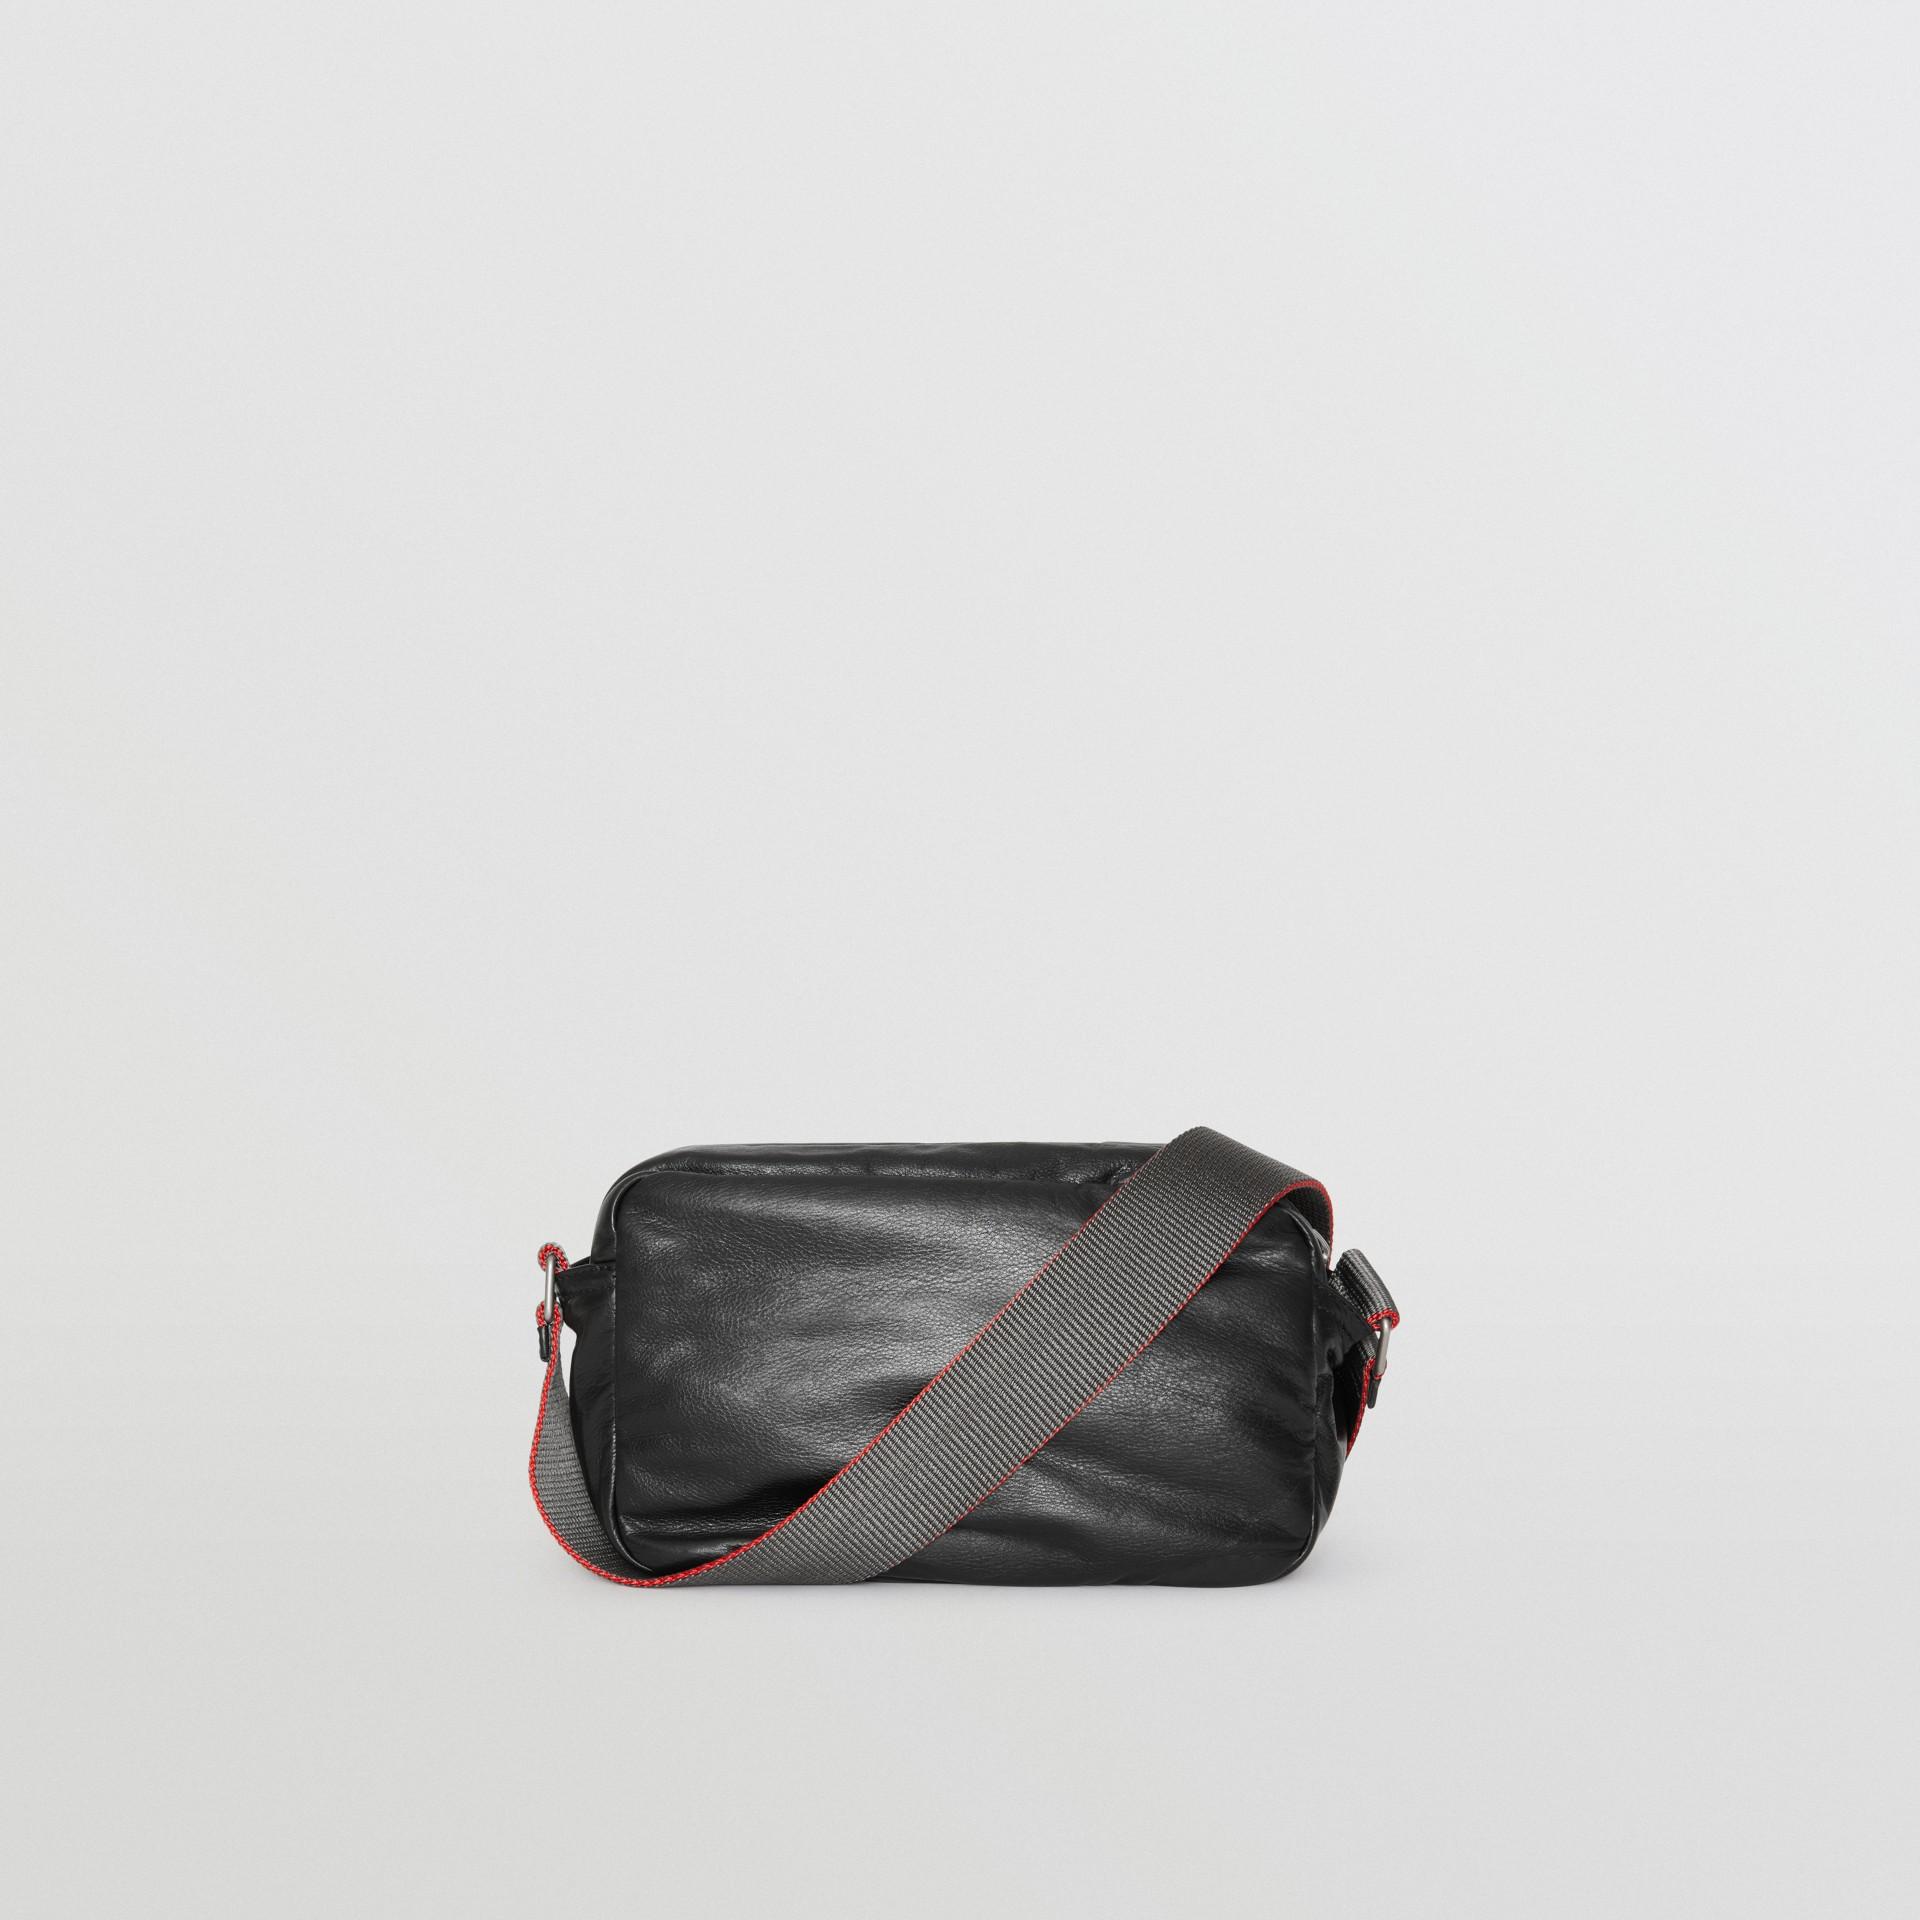 EKD Nappa Leather Crossbody Bag in Black - Men | Burberry United Kingdom - gallery image 5